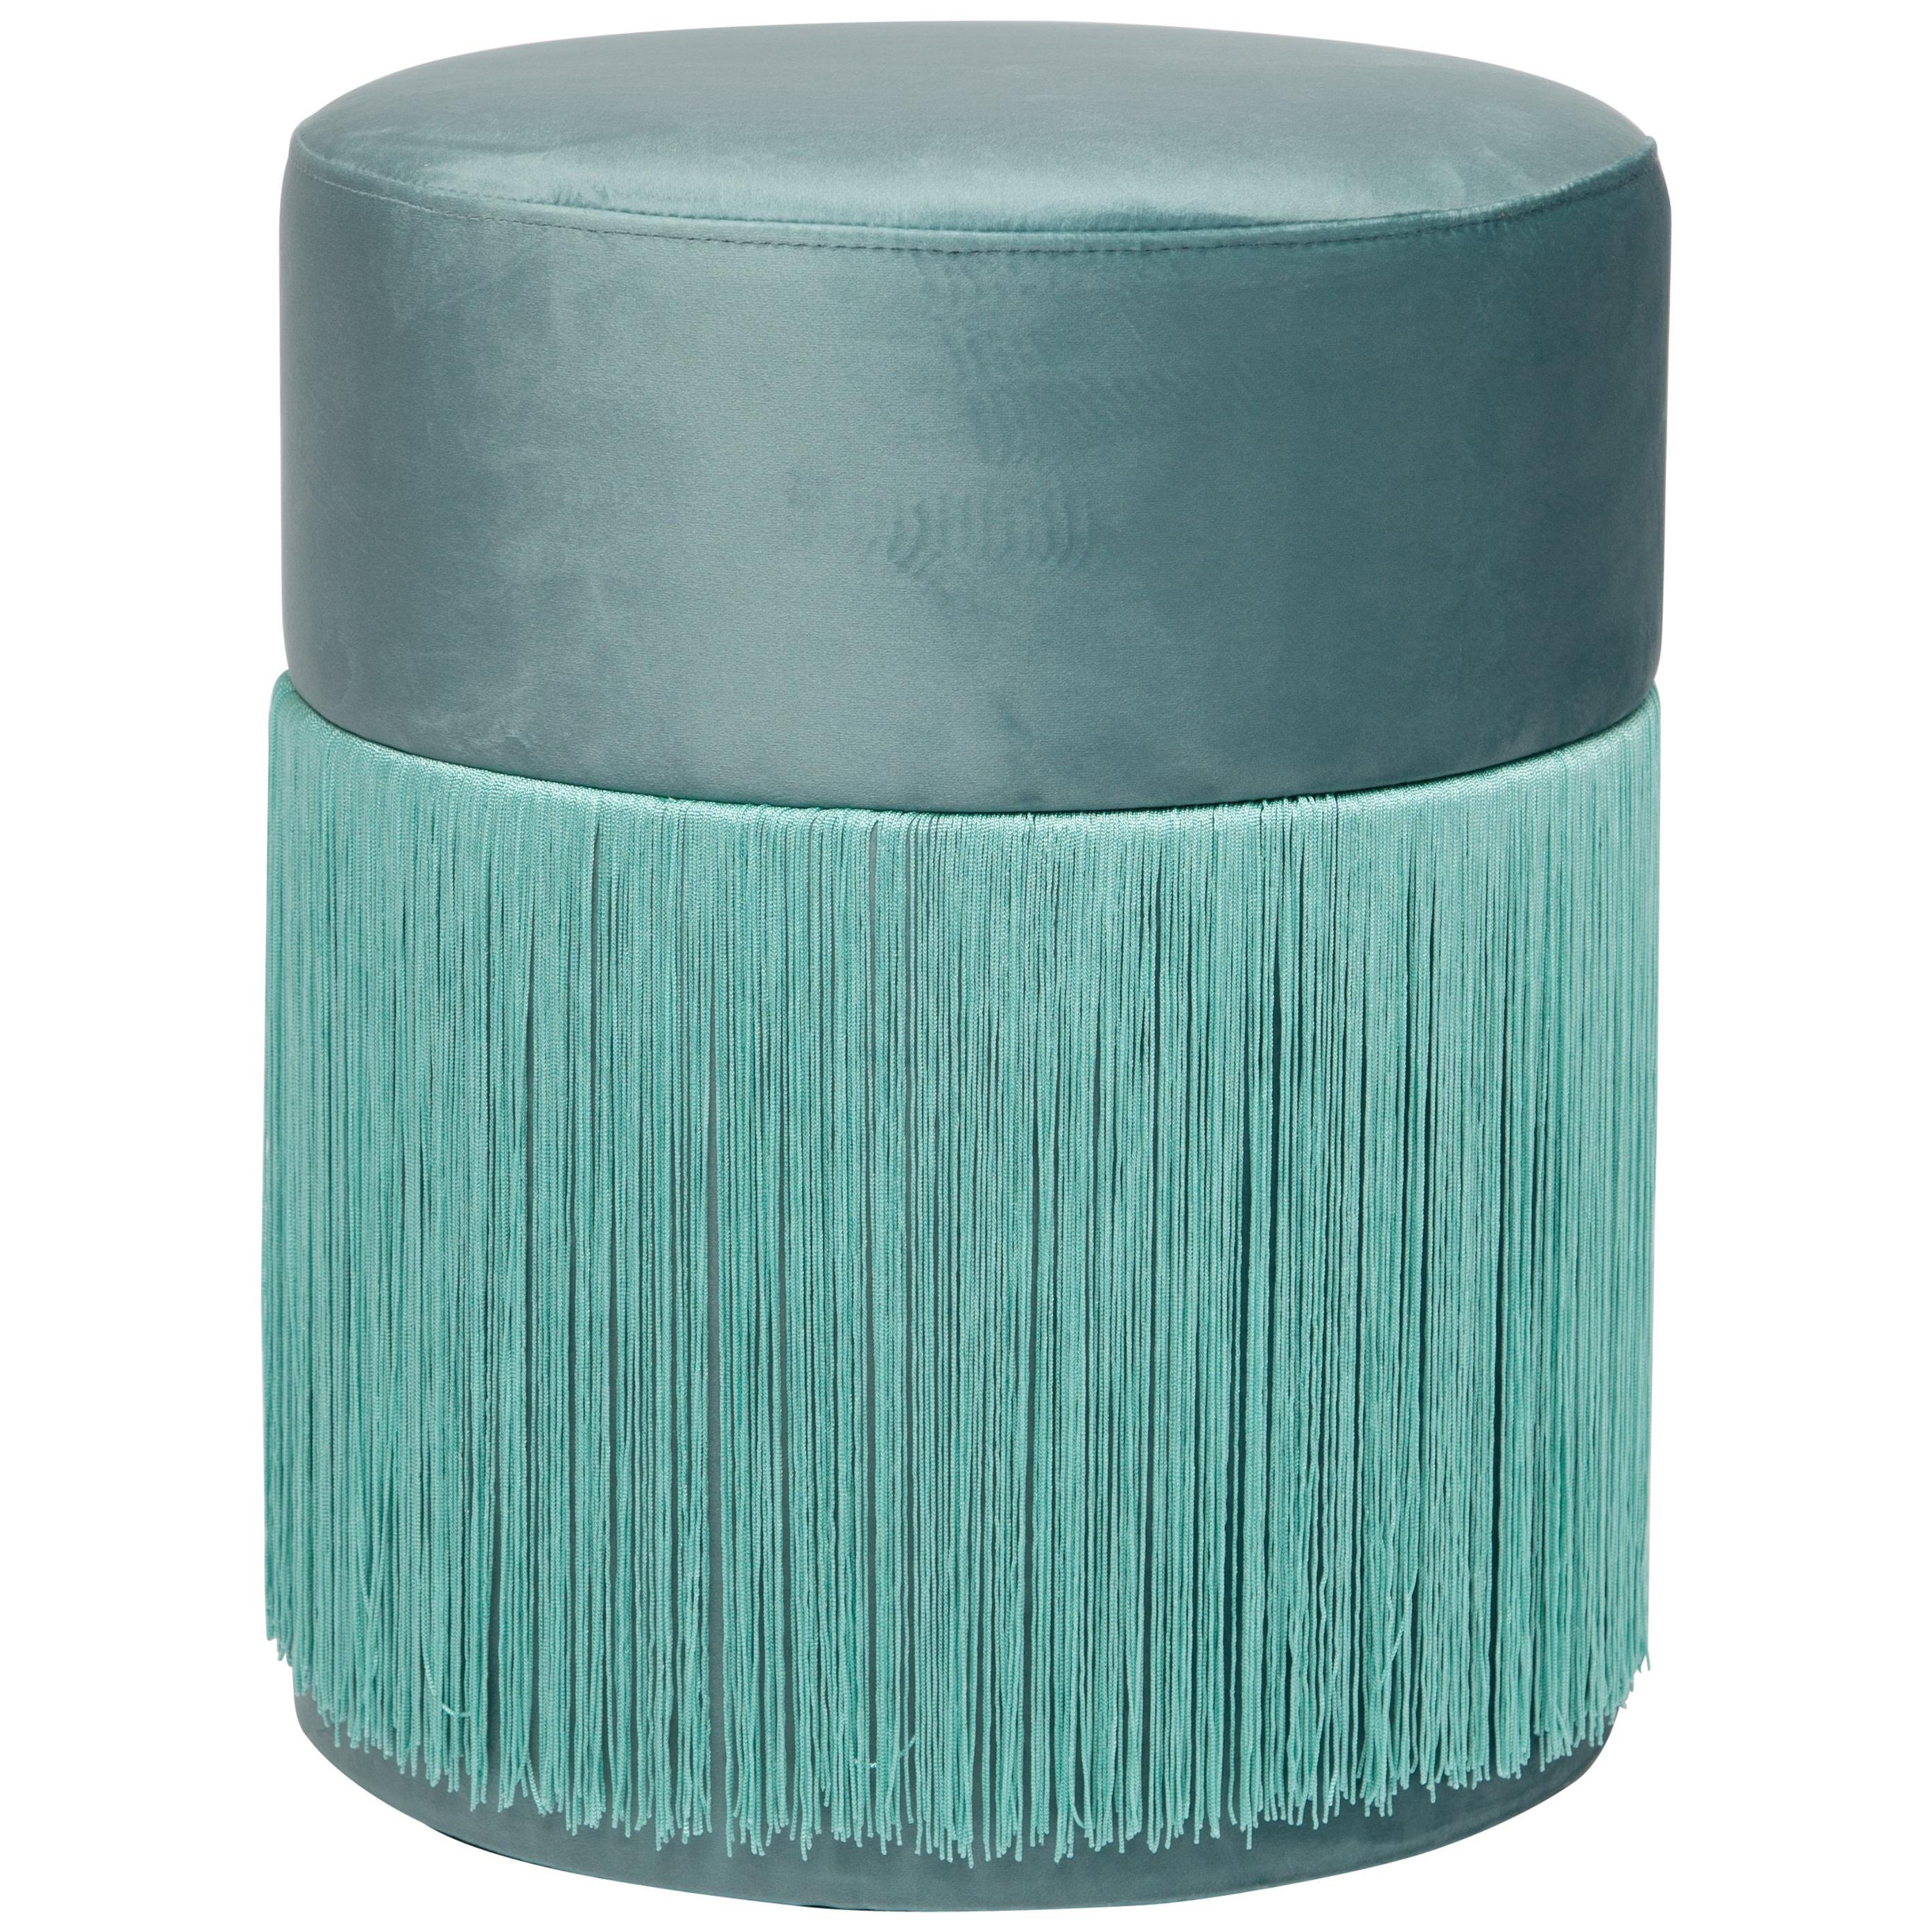 Pouf Pill Turquoise in Velvet Upholstery with Fringes